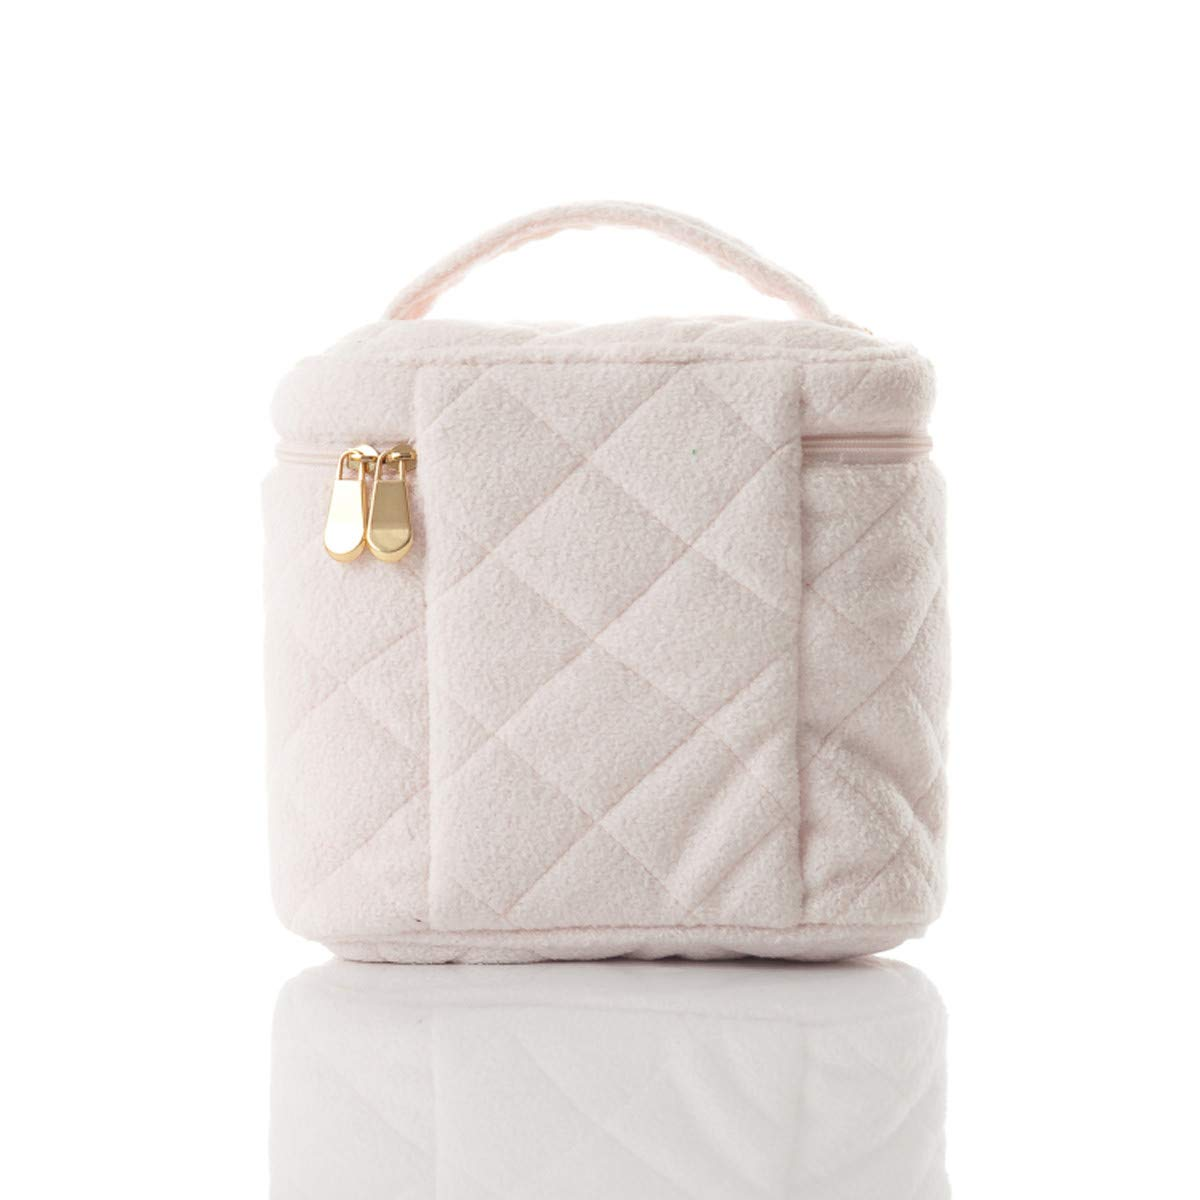 Wolegequ pearl velvet, velvet, velvet, ricami, manuale, cilindrica trousse, portatili portatrucco, la borsa, in borsa,rosa | Nuovi prodotti nel 2019  | Acquisti online  e492d0